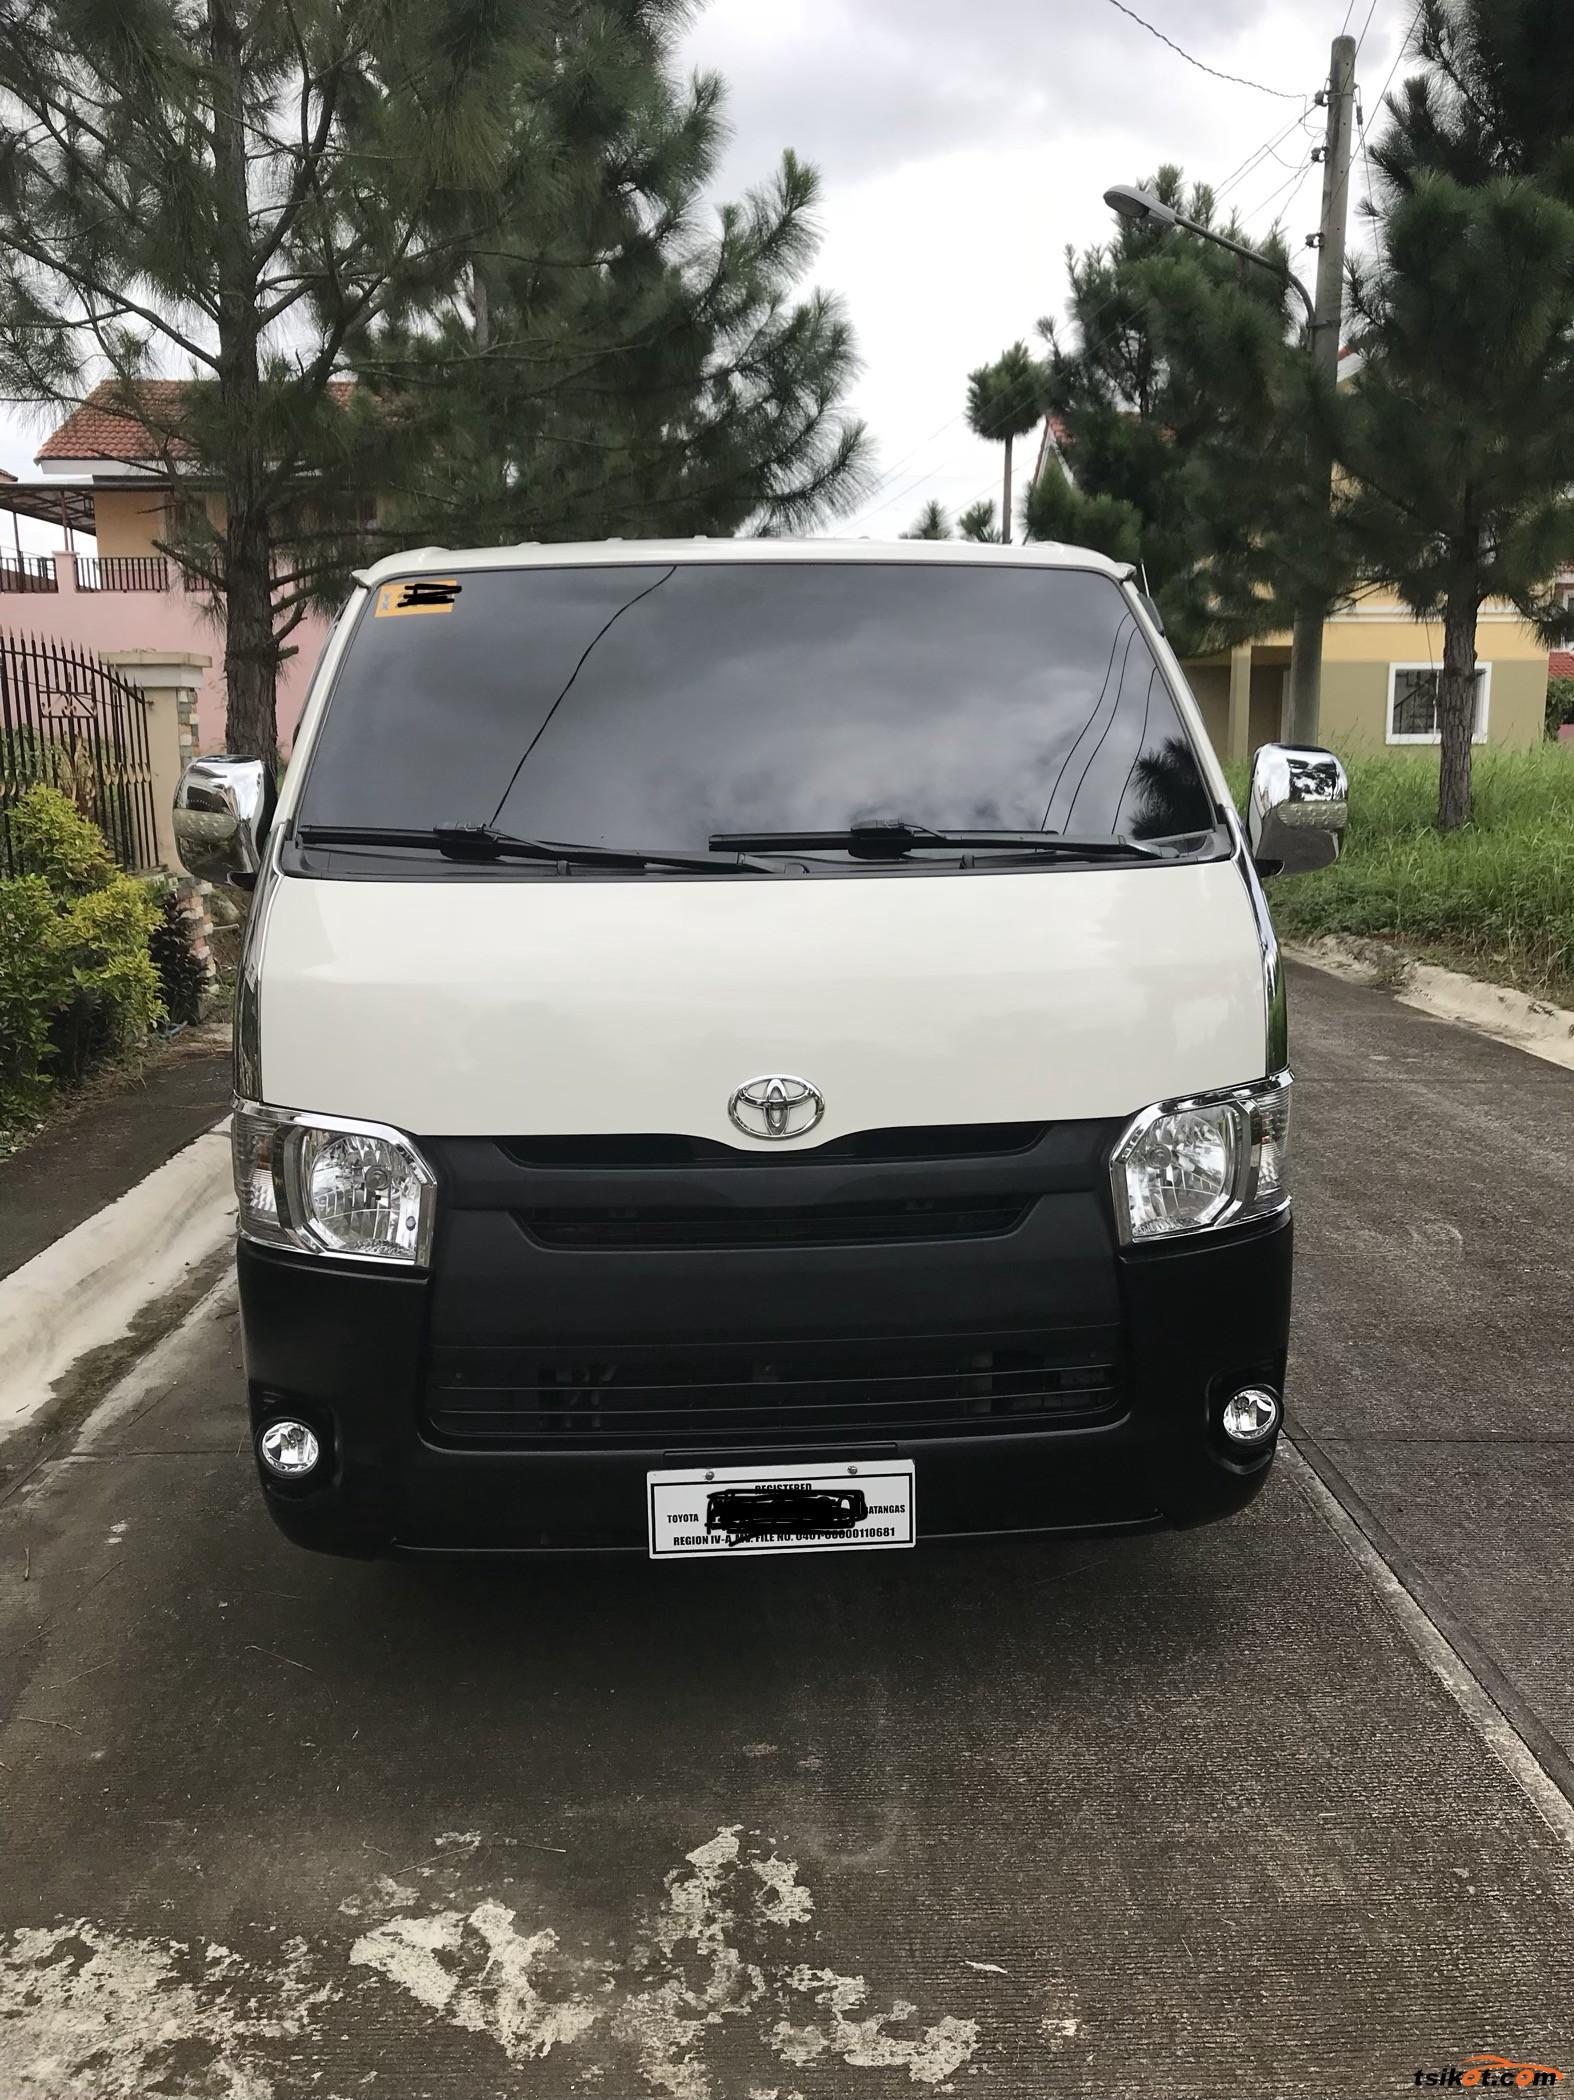 Toyota Hiace 2016 - Car for Sale Calabarzon